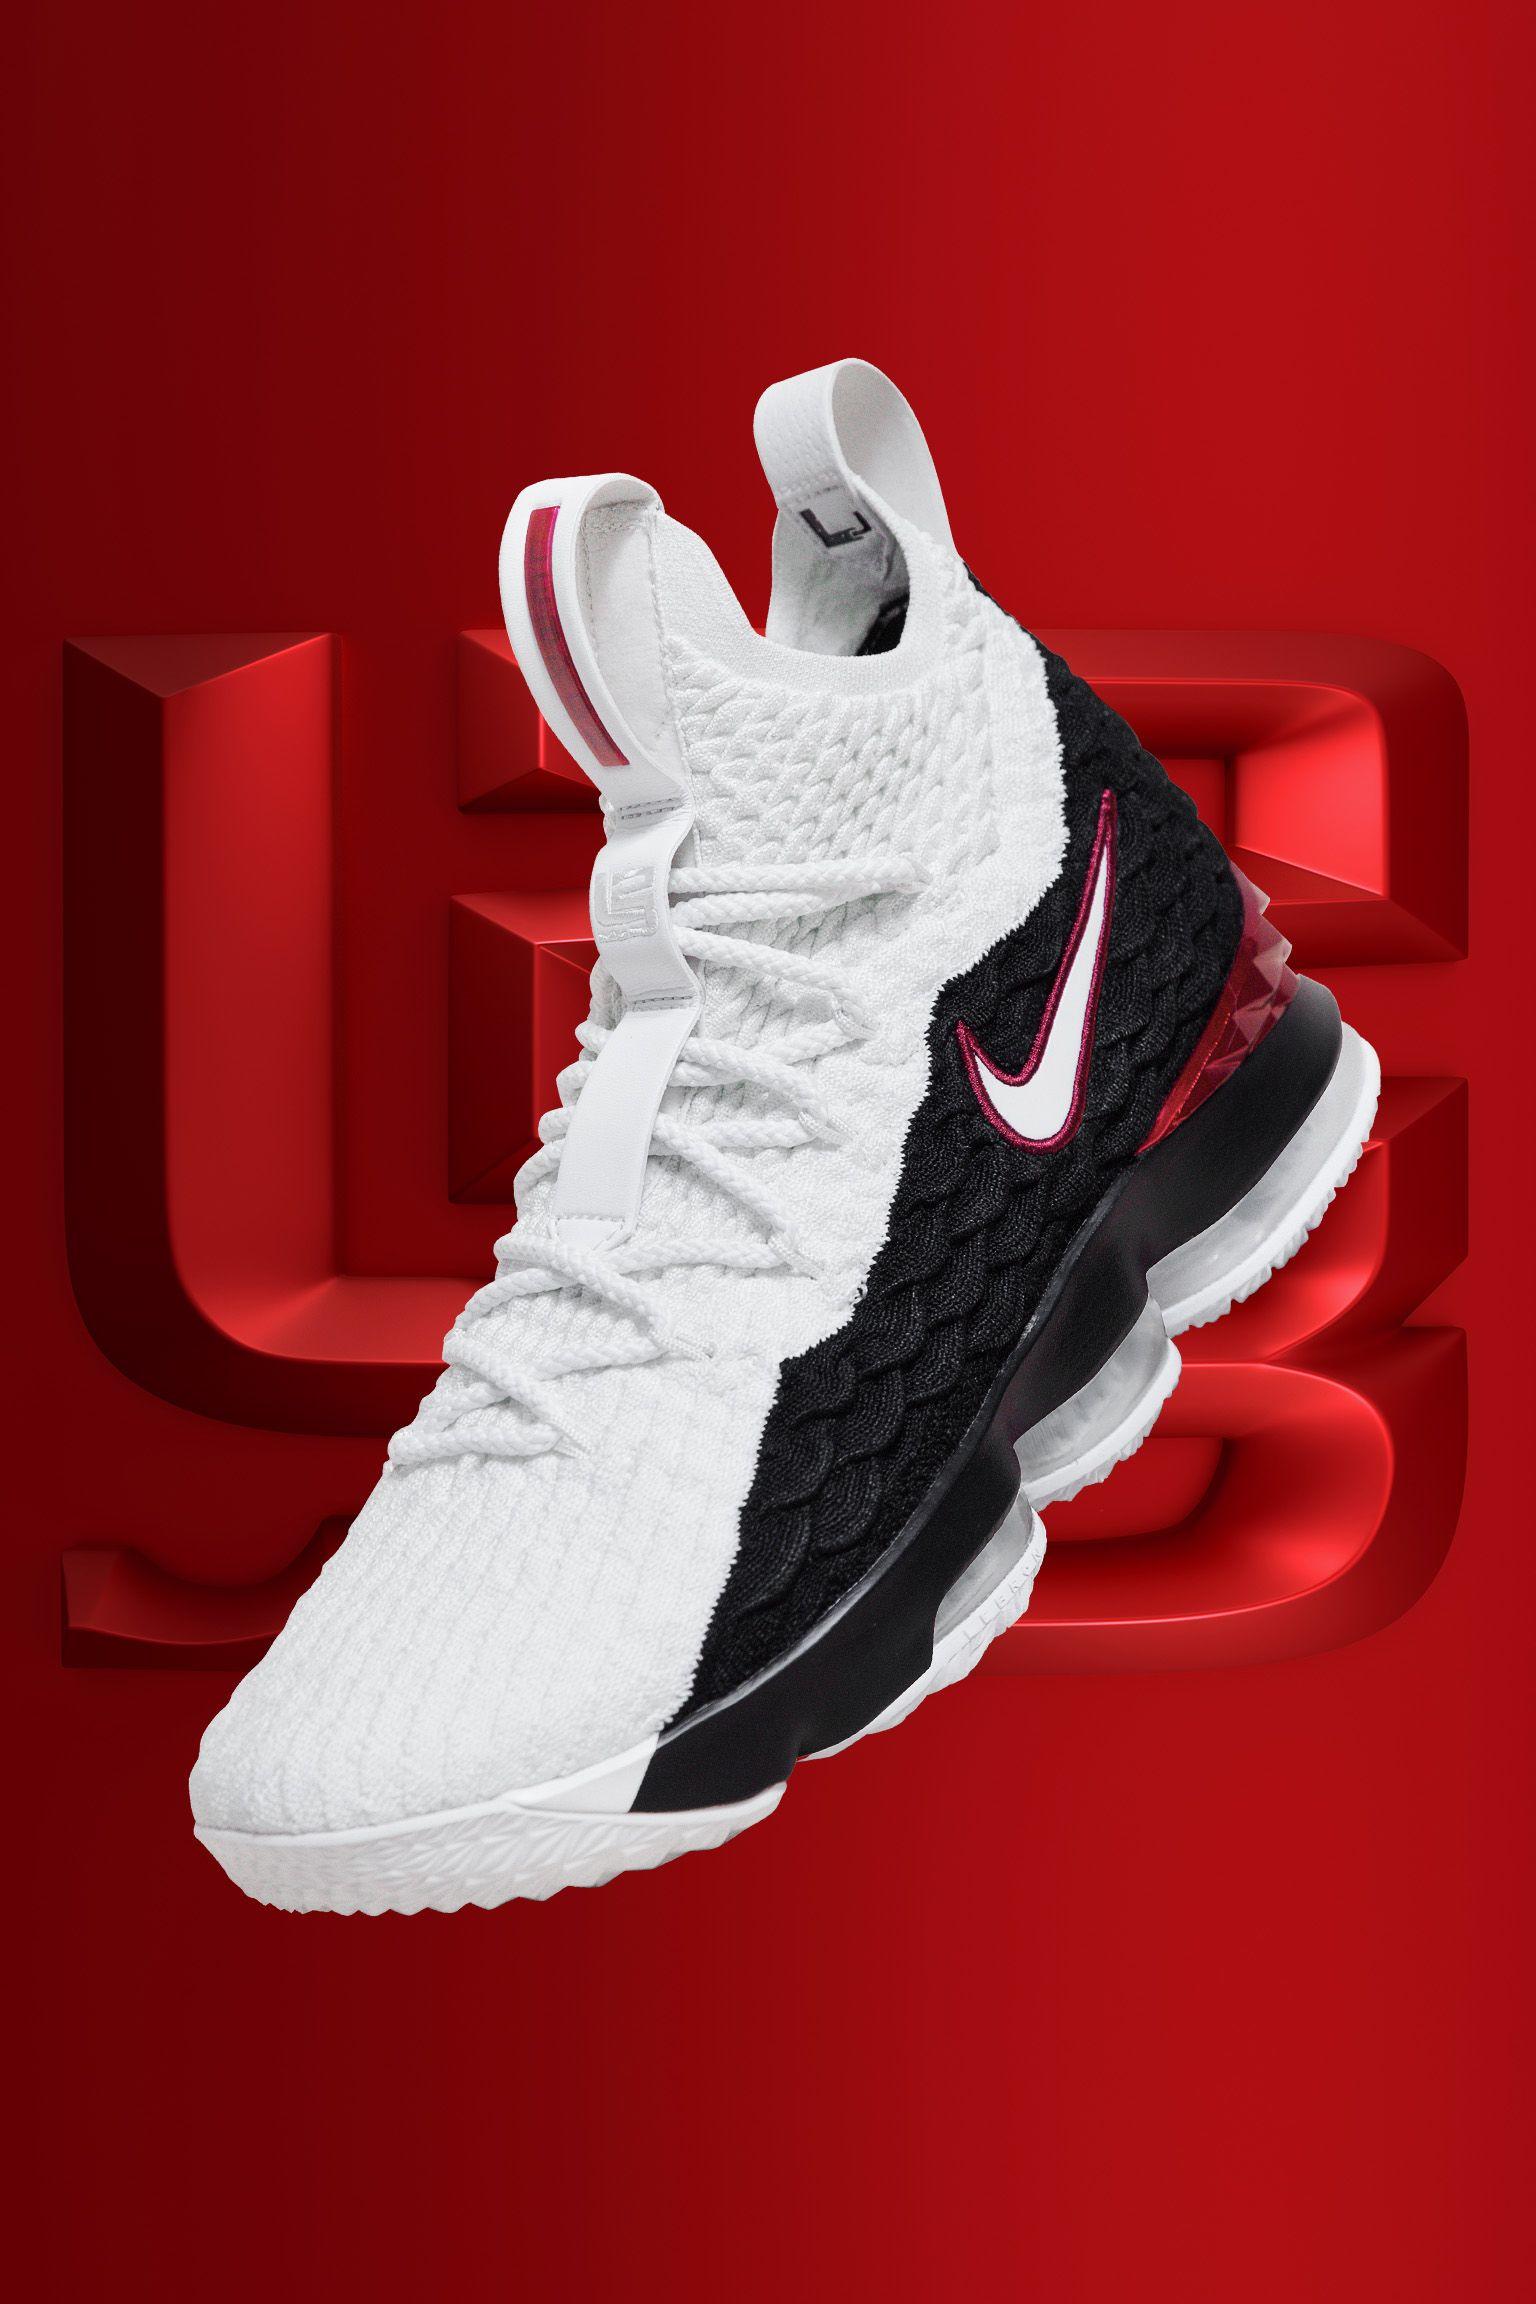 Nike Lebron 15 LeBron Watch 'Air Zoom Generation'. Nike SNKRS